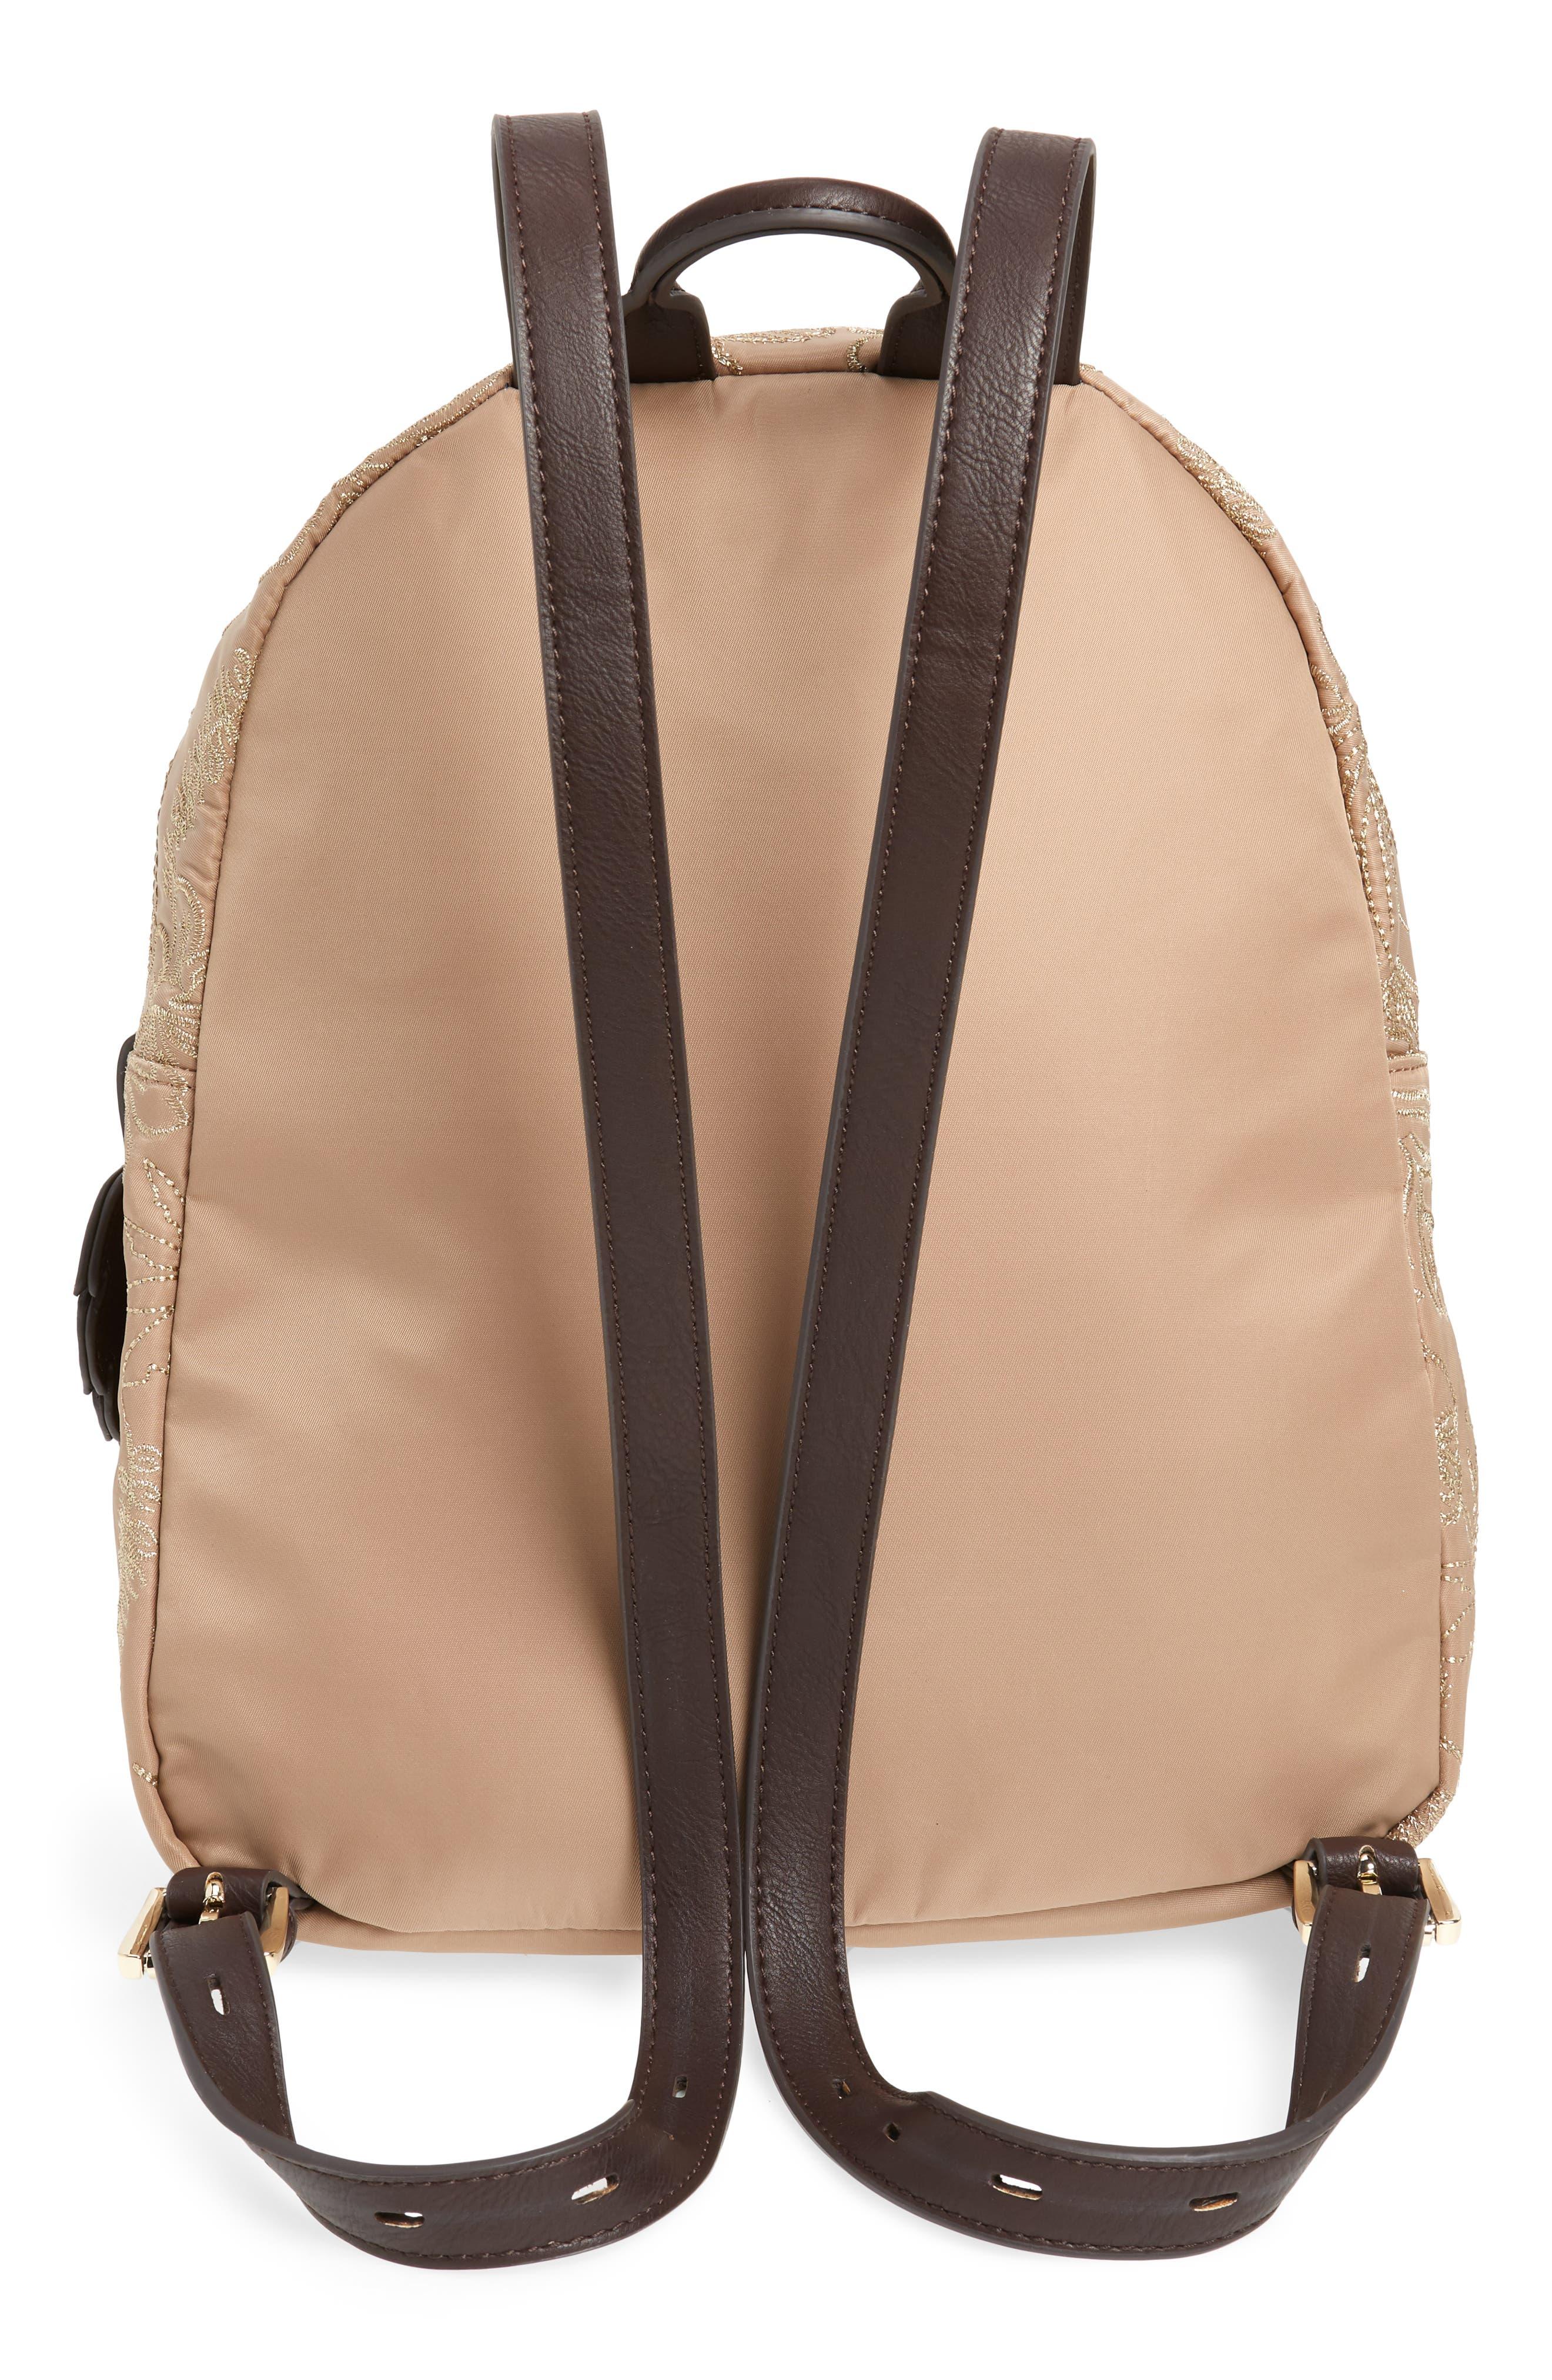 Siesta Key Backpack,                             Alternate thumbnail 3, color,                             230